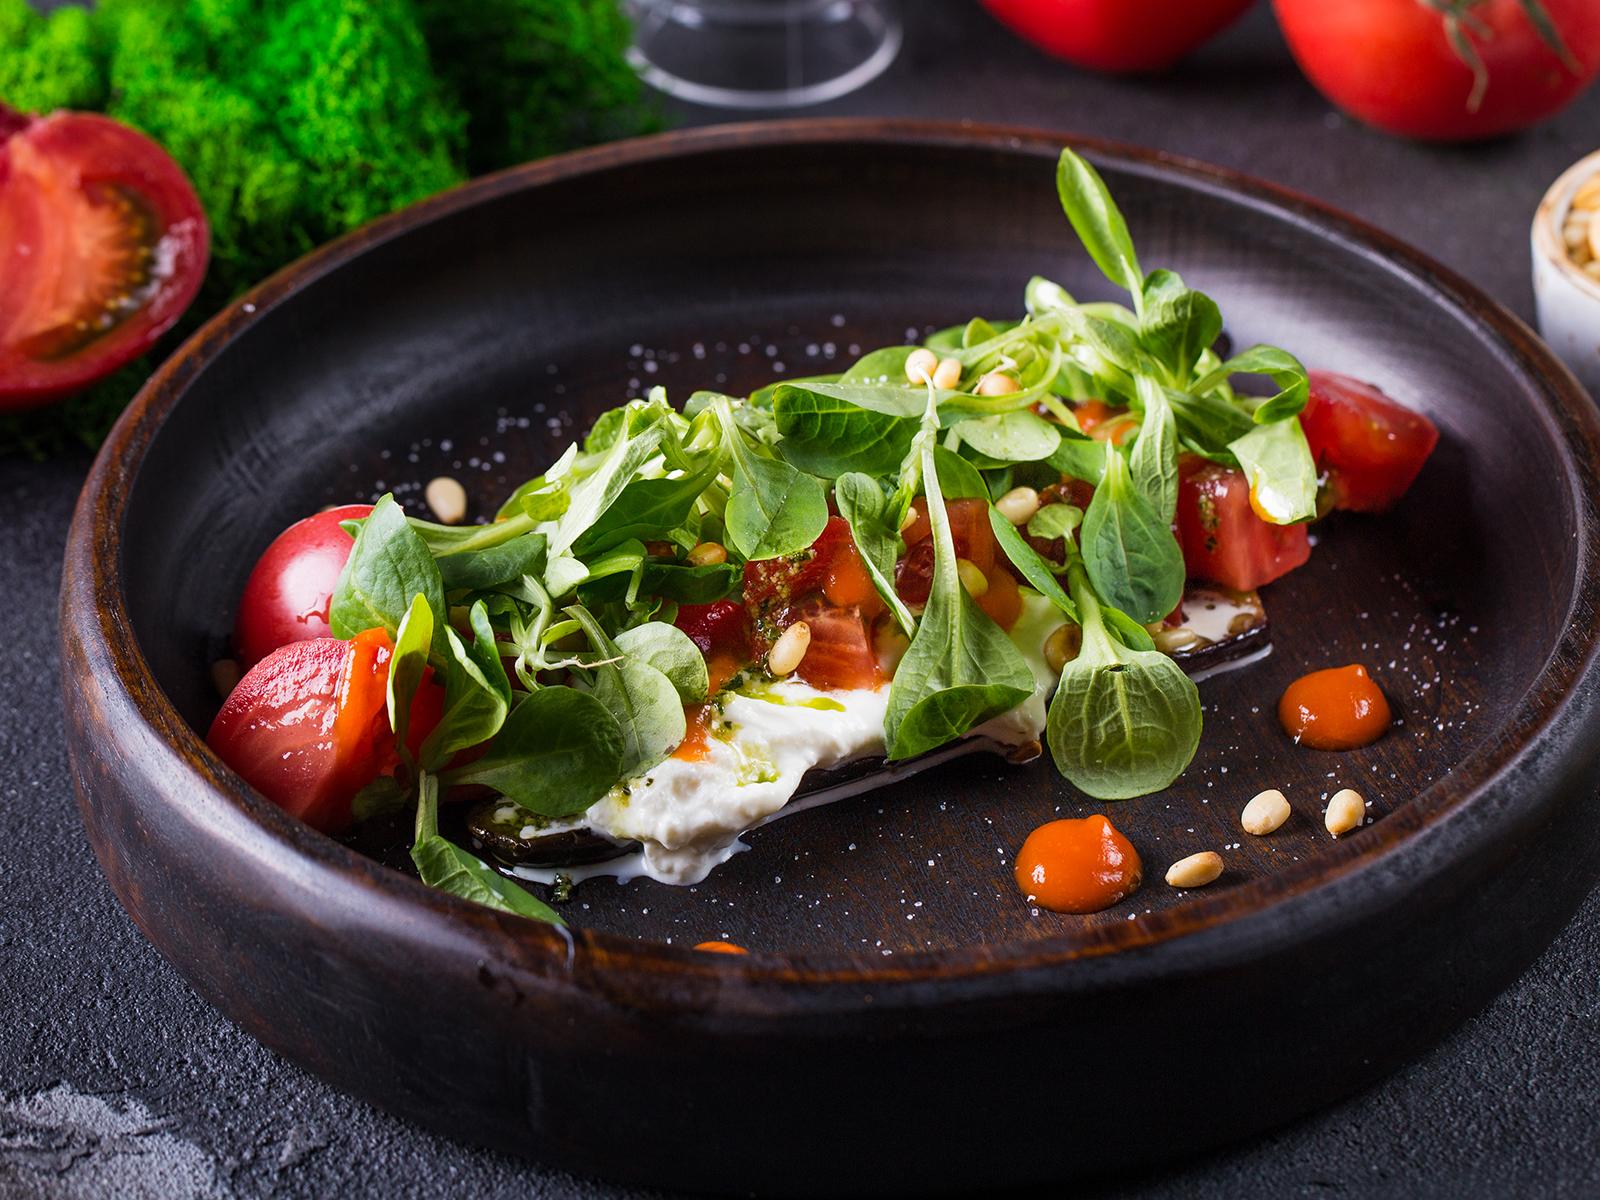 Салат со страчателлой и баклажанами